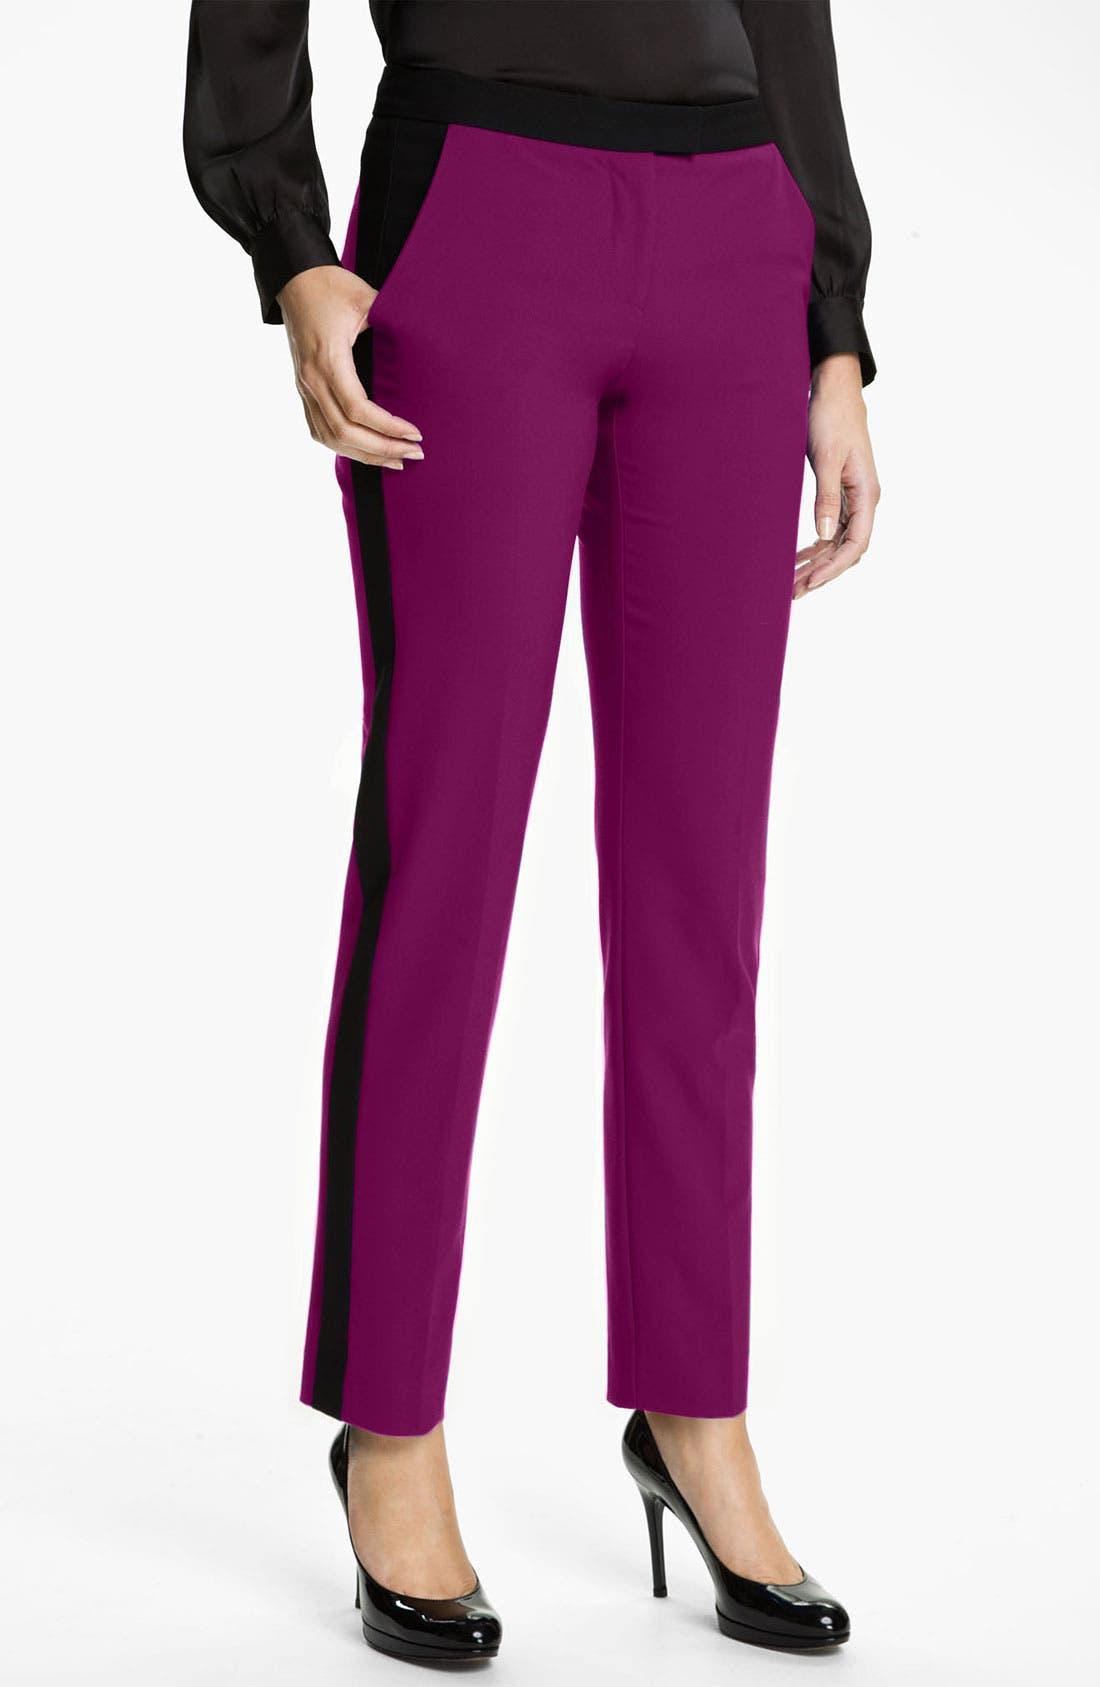 Alternate Image 1 Selected - Vince Camuto Colorblock Pants (Petite)